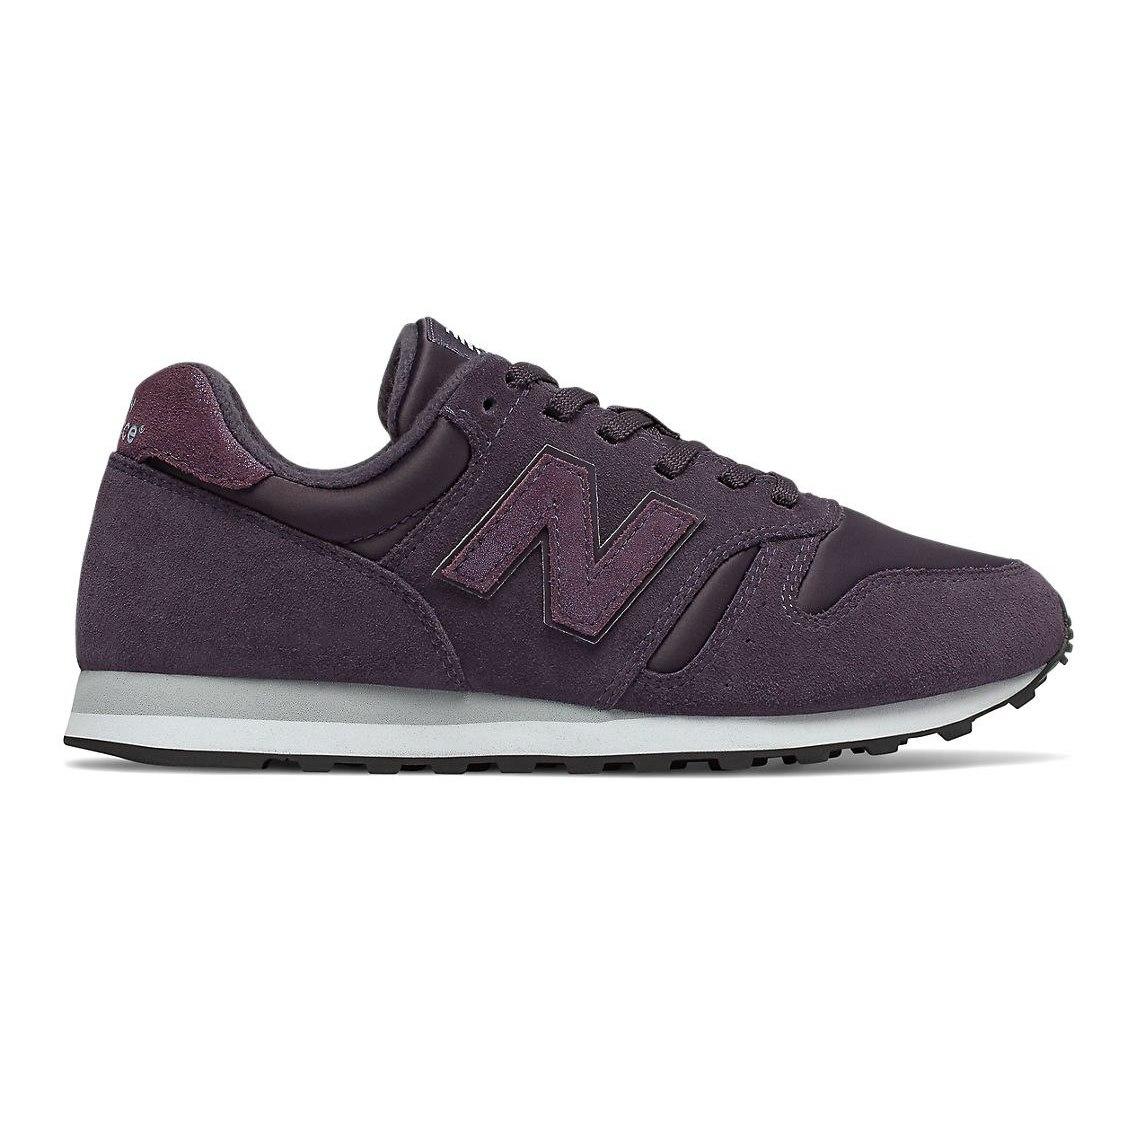 économiser 49894 26682 Chaussures femme New Balance 373